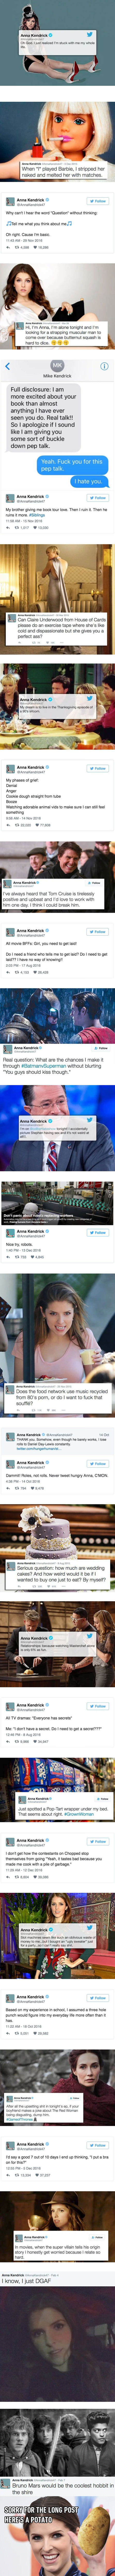 27 Anna Kendrick's tweets single-handedly saved 2016